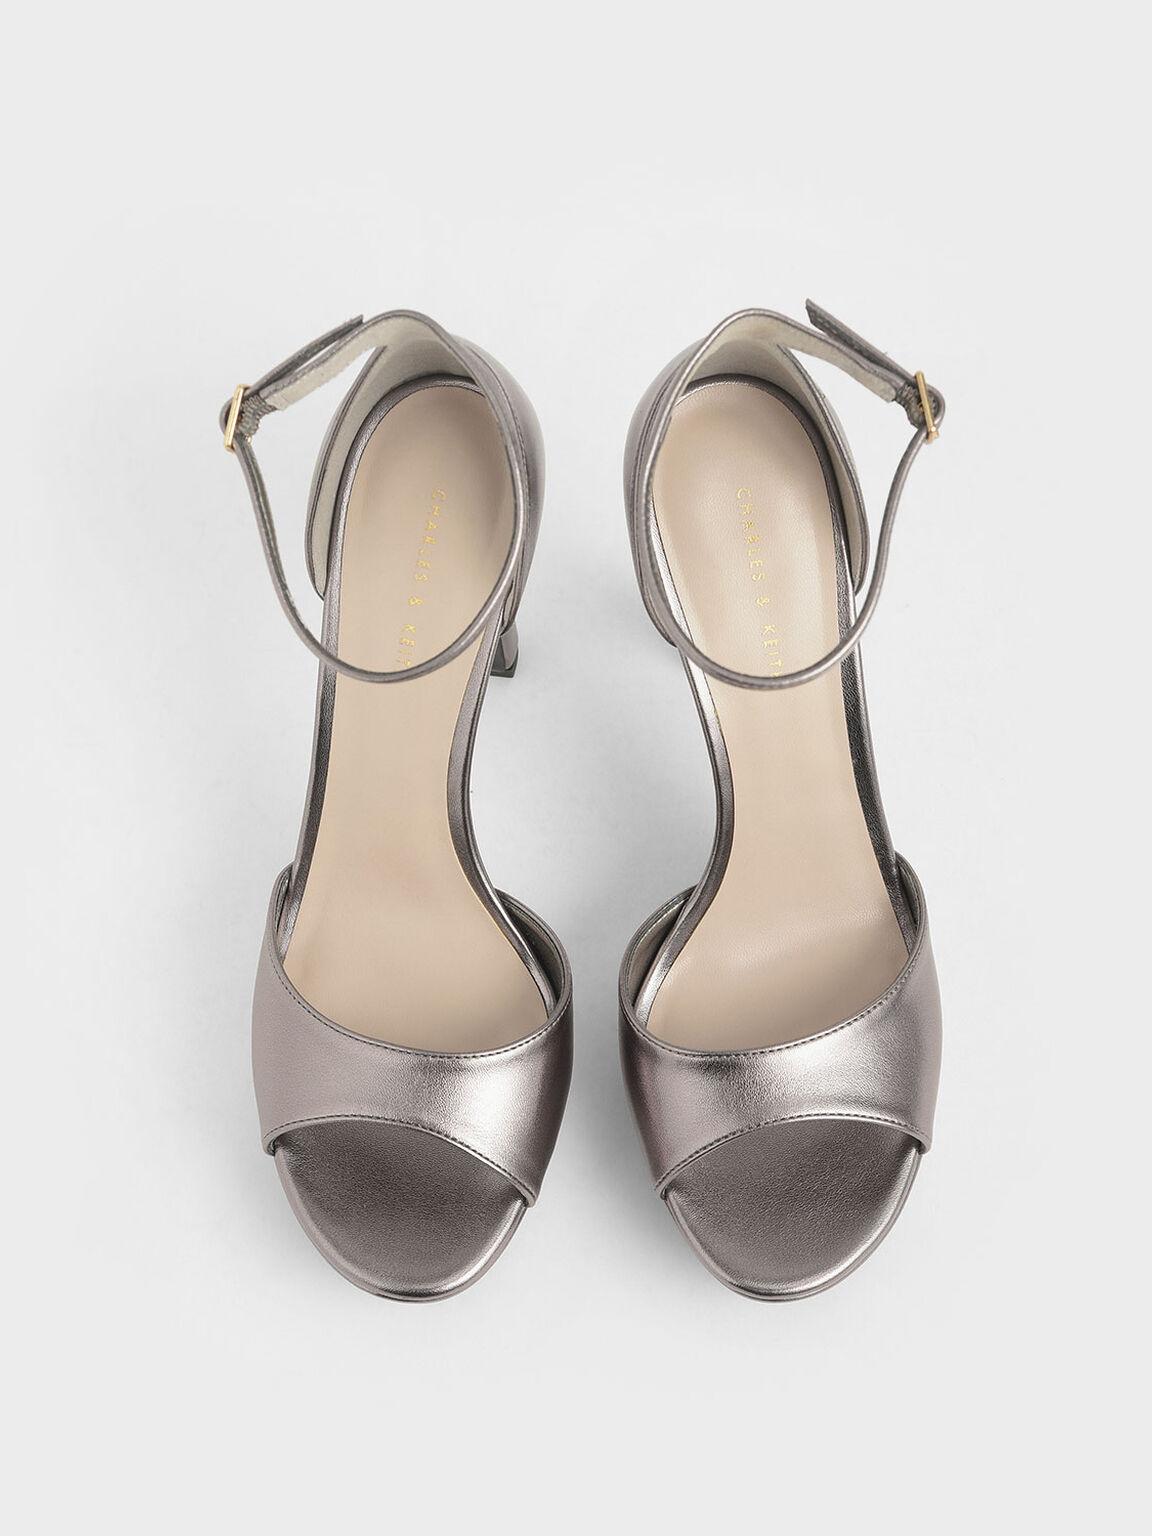 Metallic Platform Stiletto Heels, Pewter, hi-res